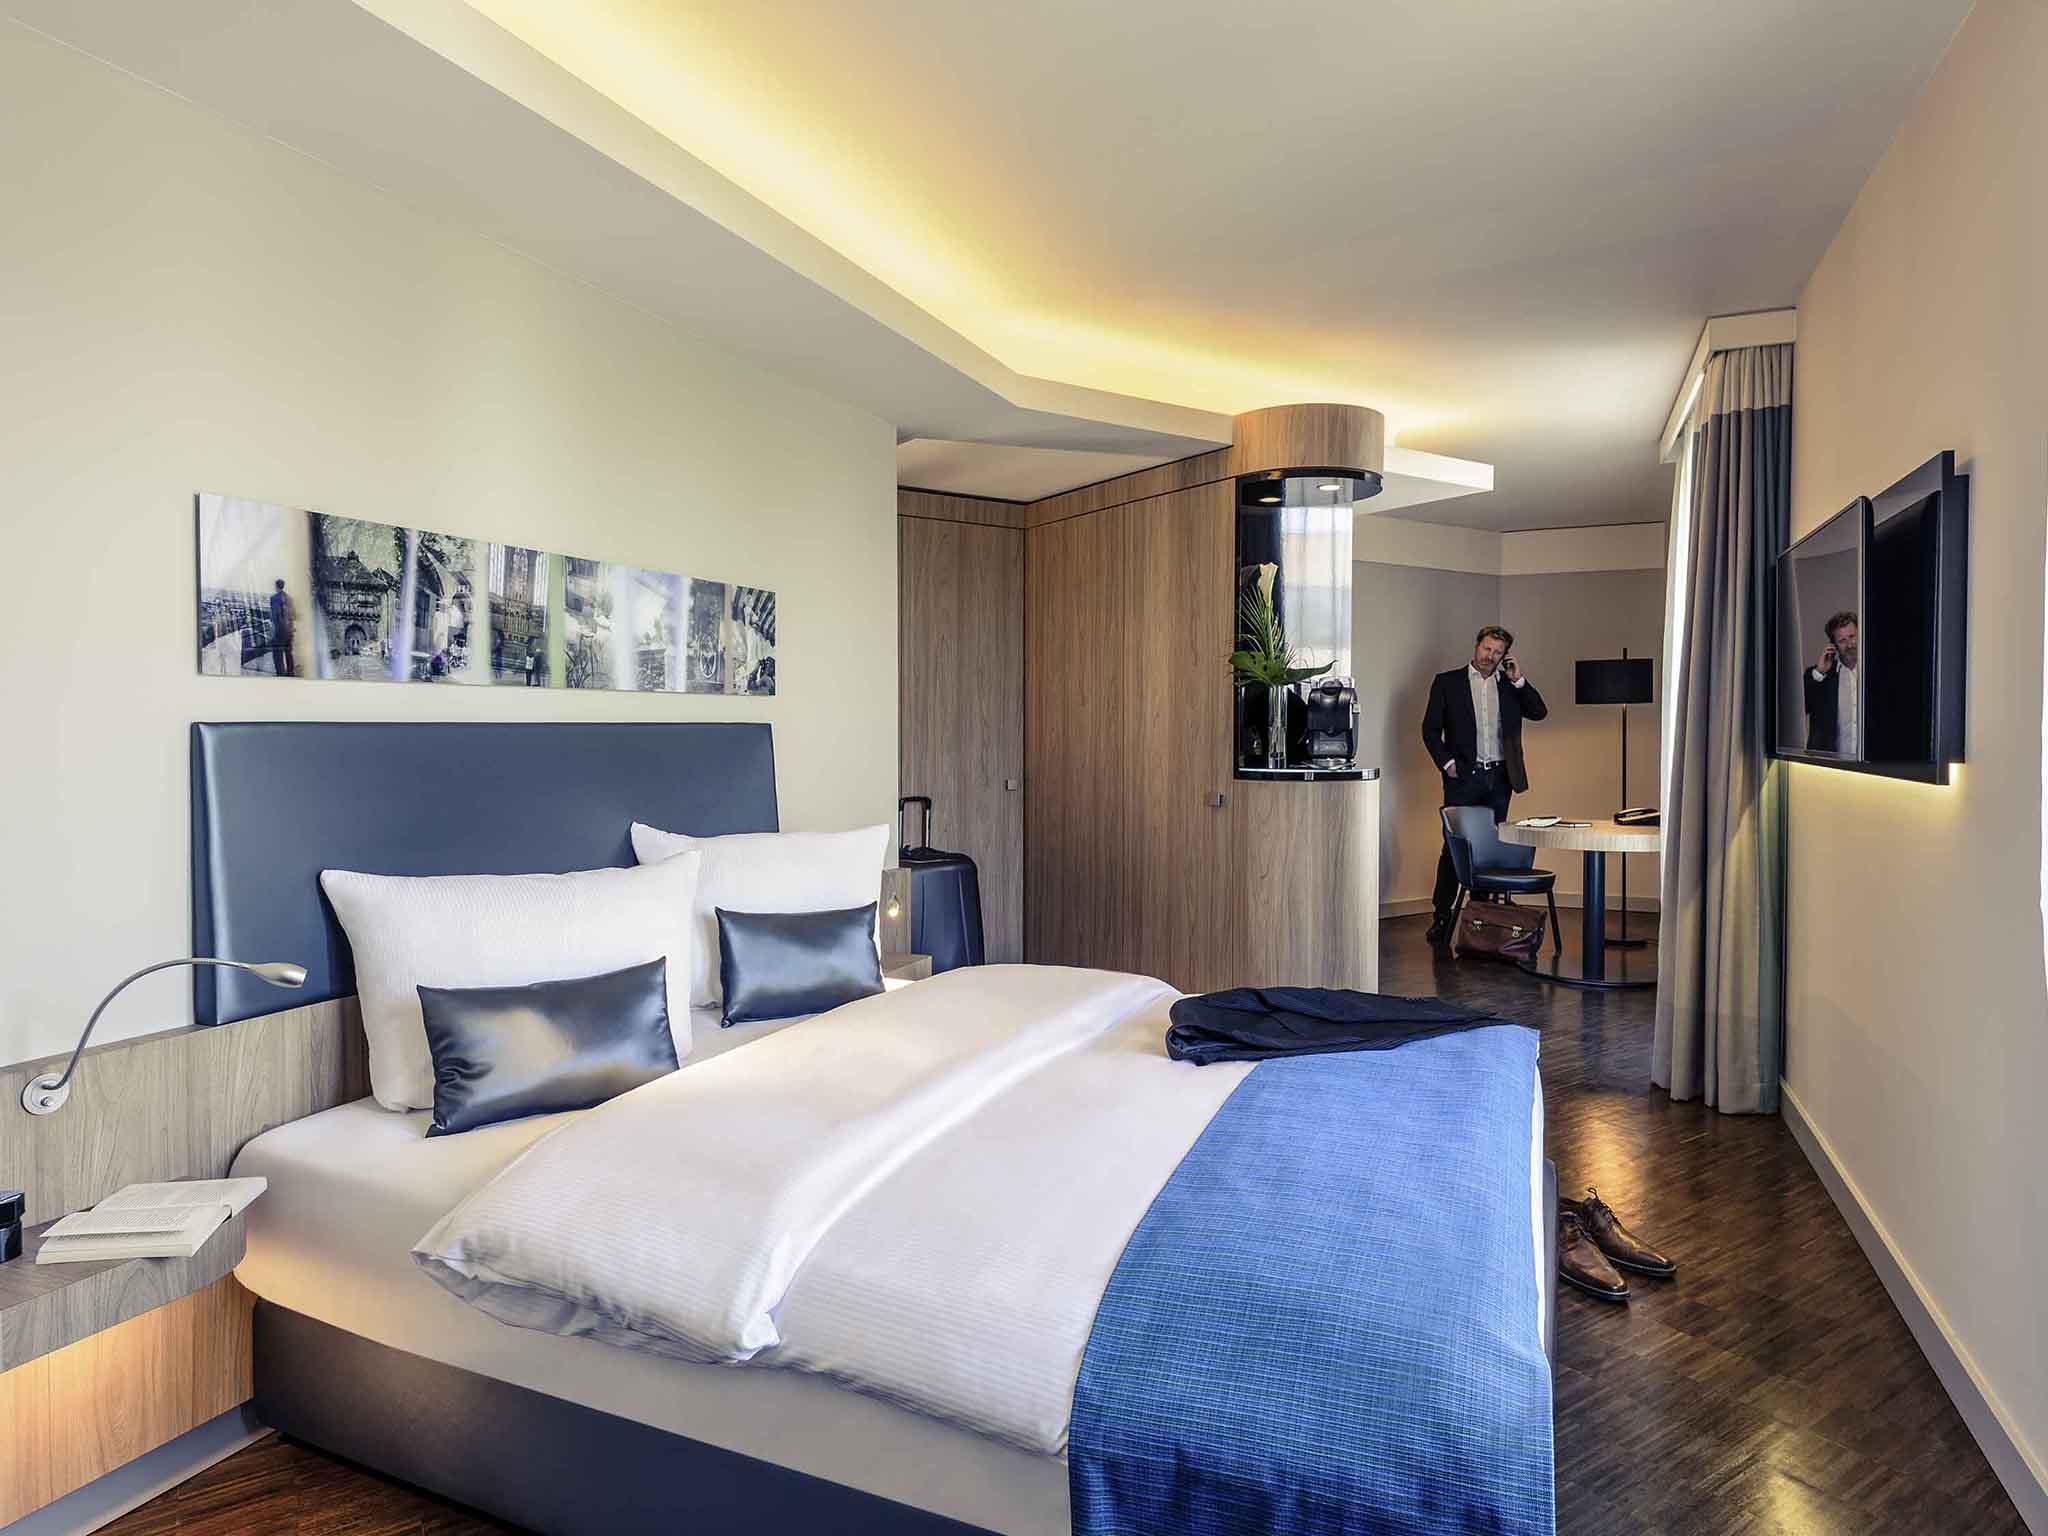 High Quality ... Rooms   Mercure Hotel Heilbronn ...